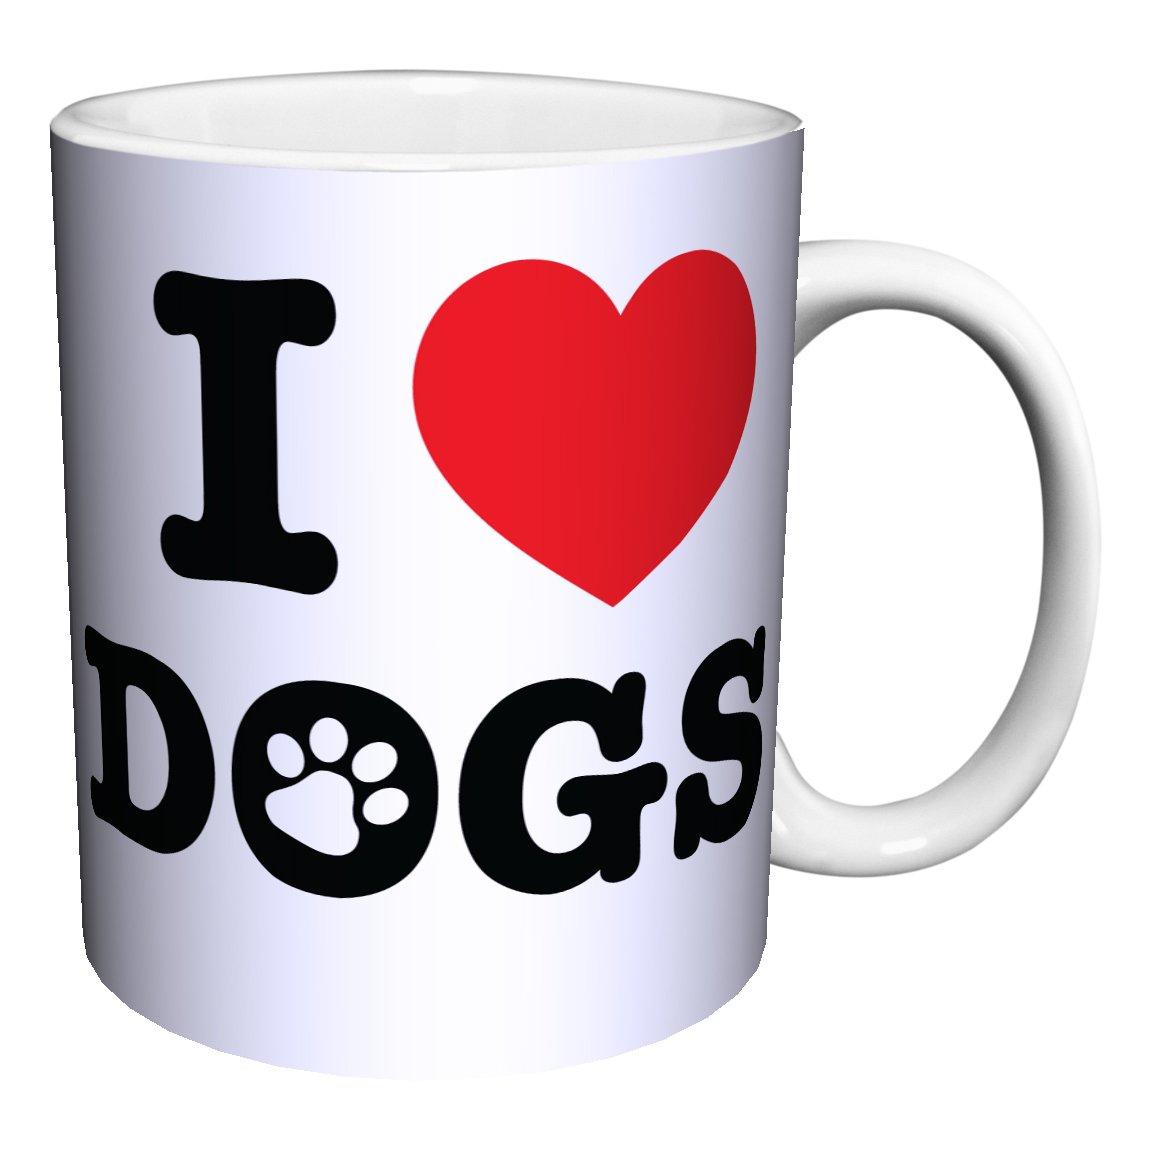 I Heart Dogs Novelty Animal Lover Pet Quote Decorative Ceramic Gift Coffee (Tea, Cocoa) 11 Oz. Mug